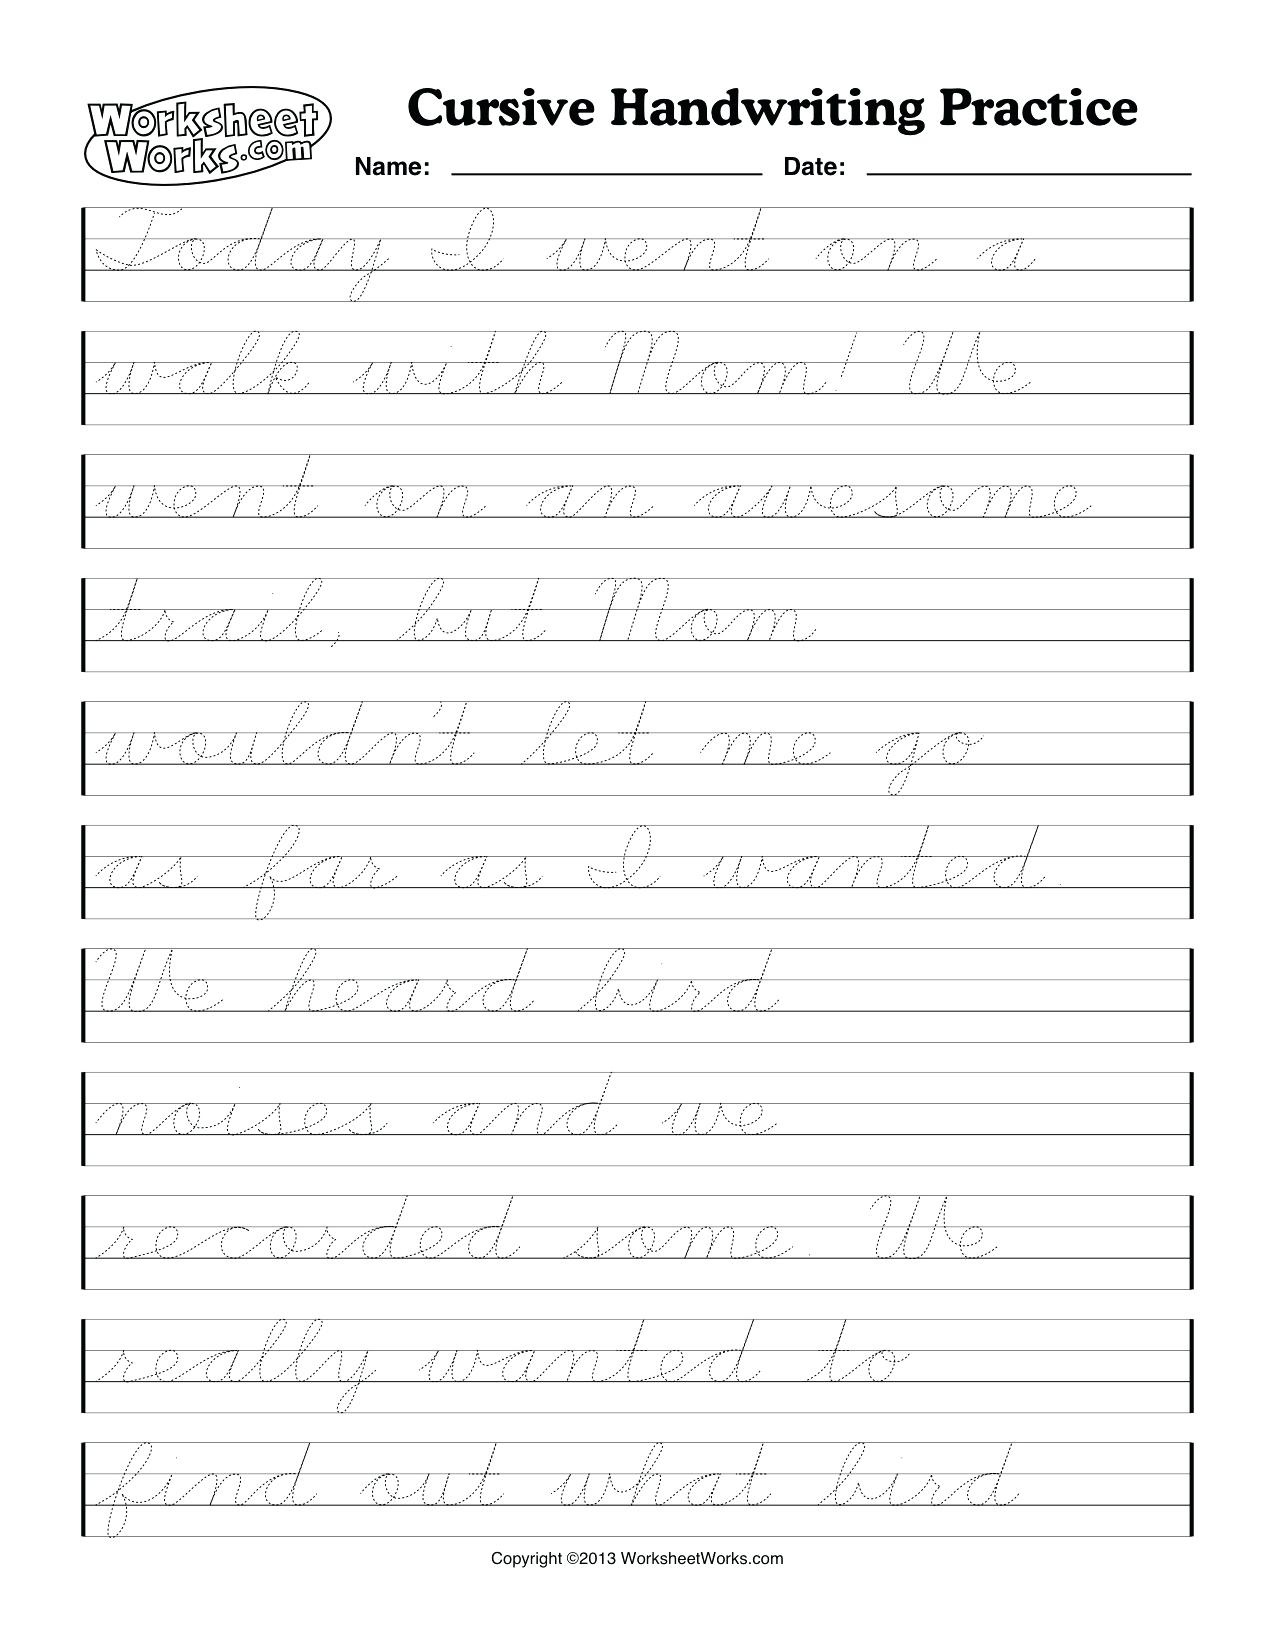 Multiplication Word Problems 4Th Grade And Cursive Writing Alphabet - Free Printable Cursive Writing Paragraphs